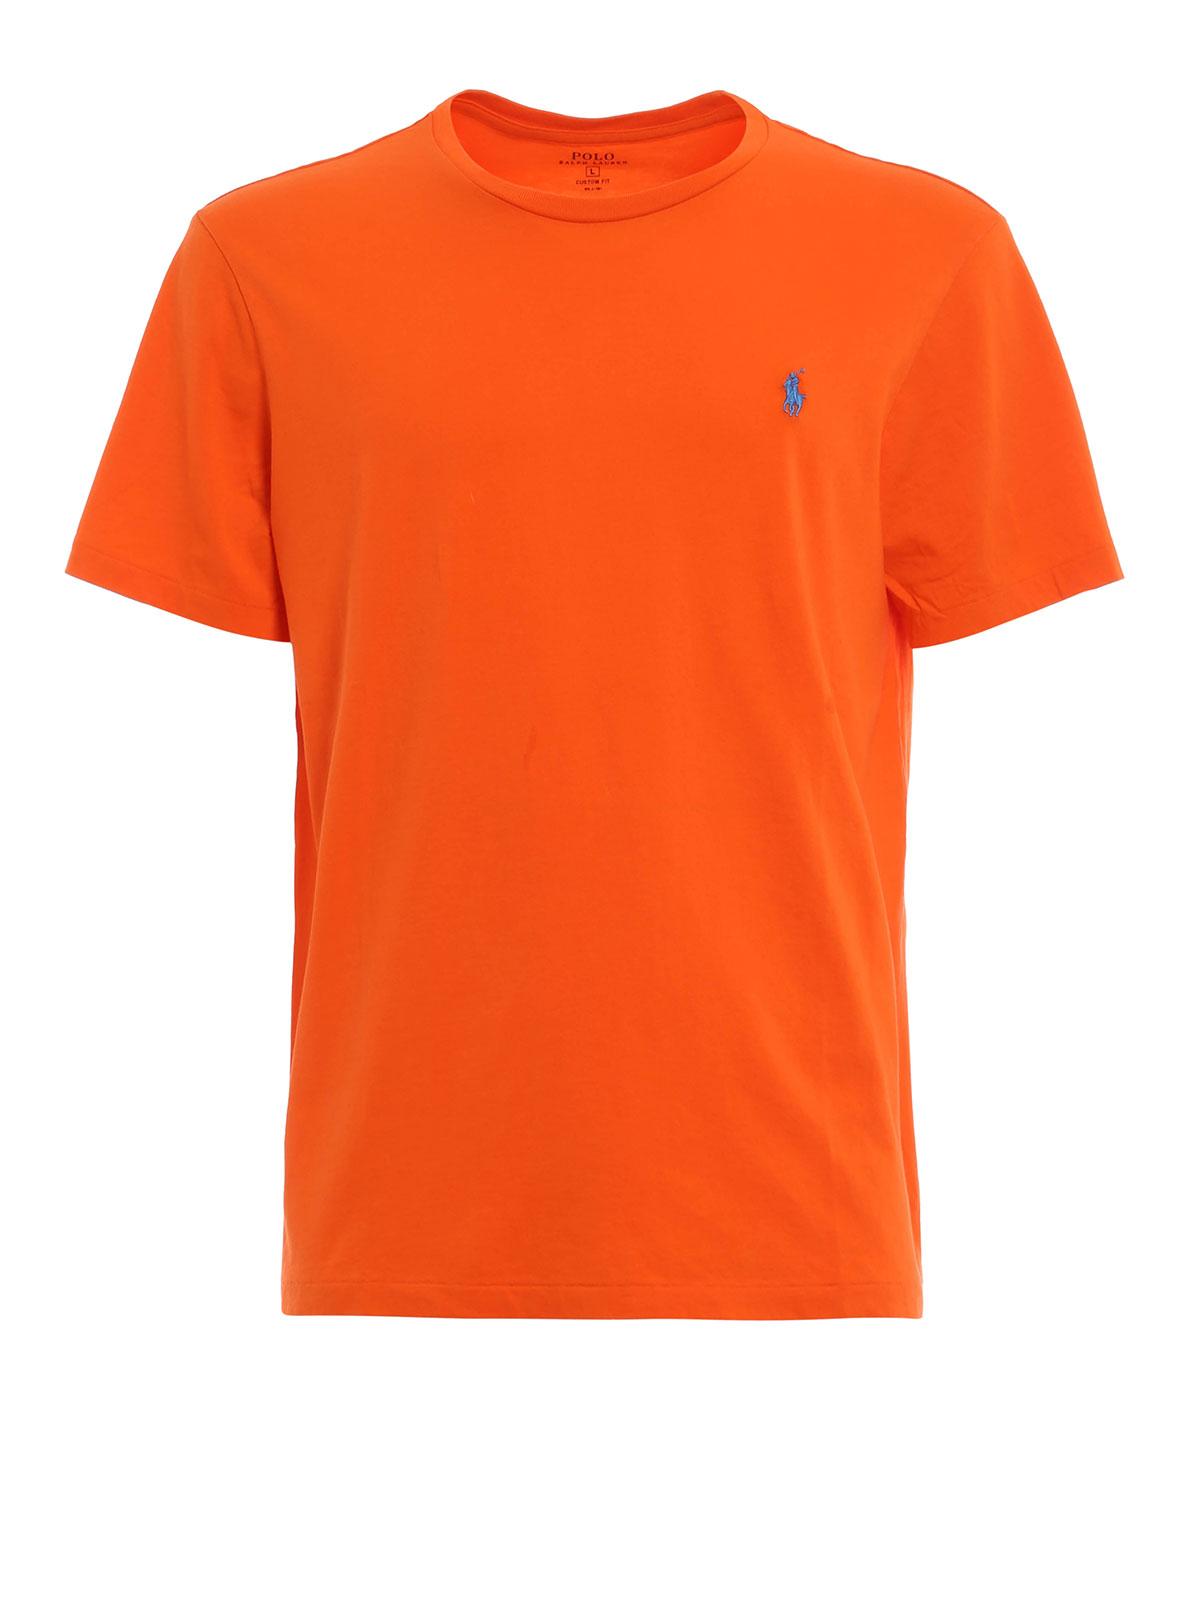 T shirt di cotone con logo polo ralph lauren t shirt ikrix for Ralph lauren logo shirt